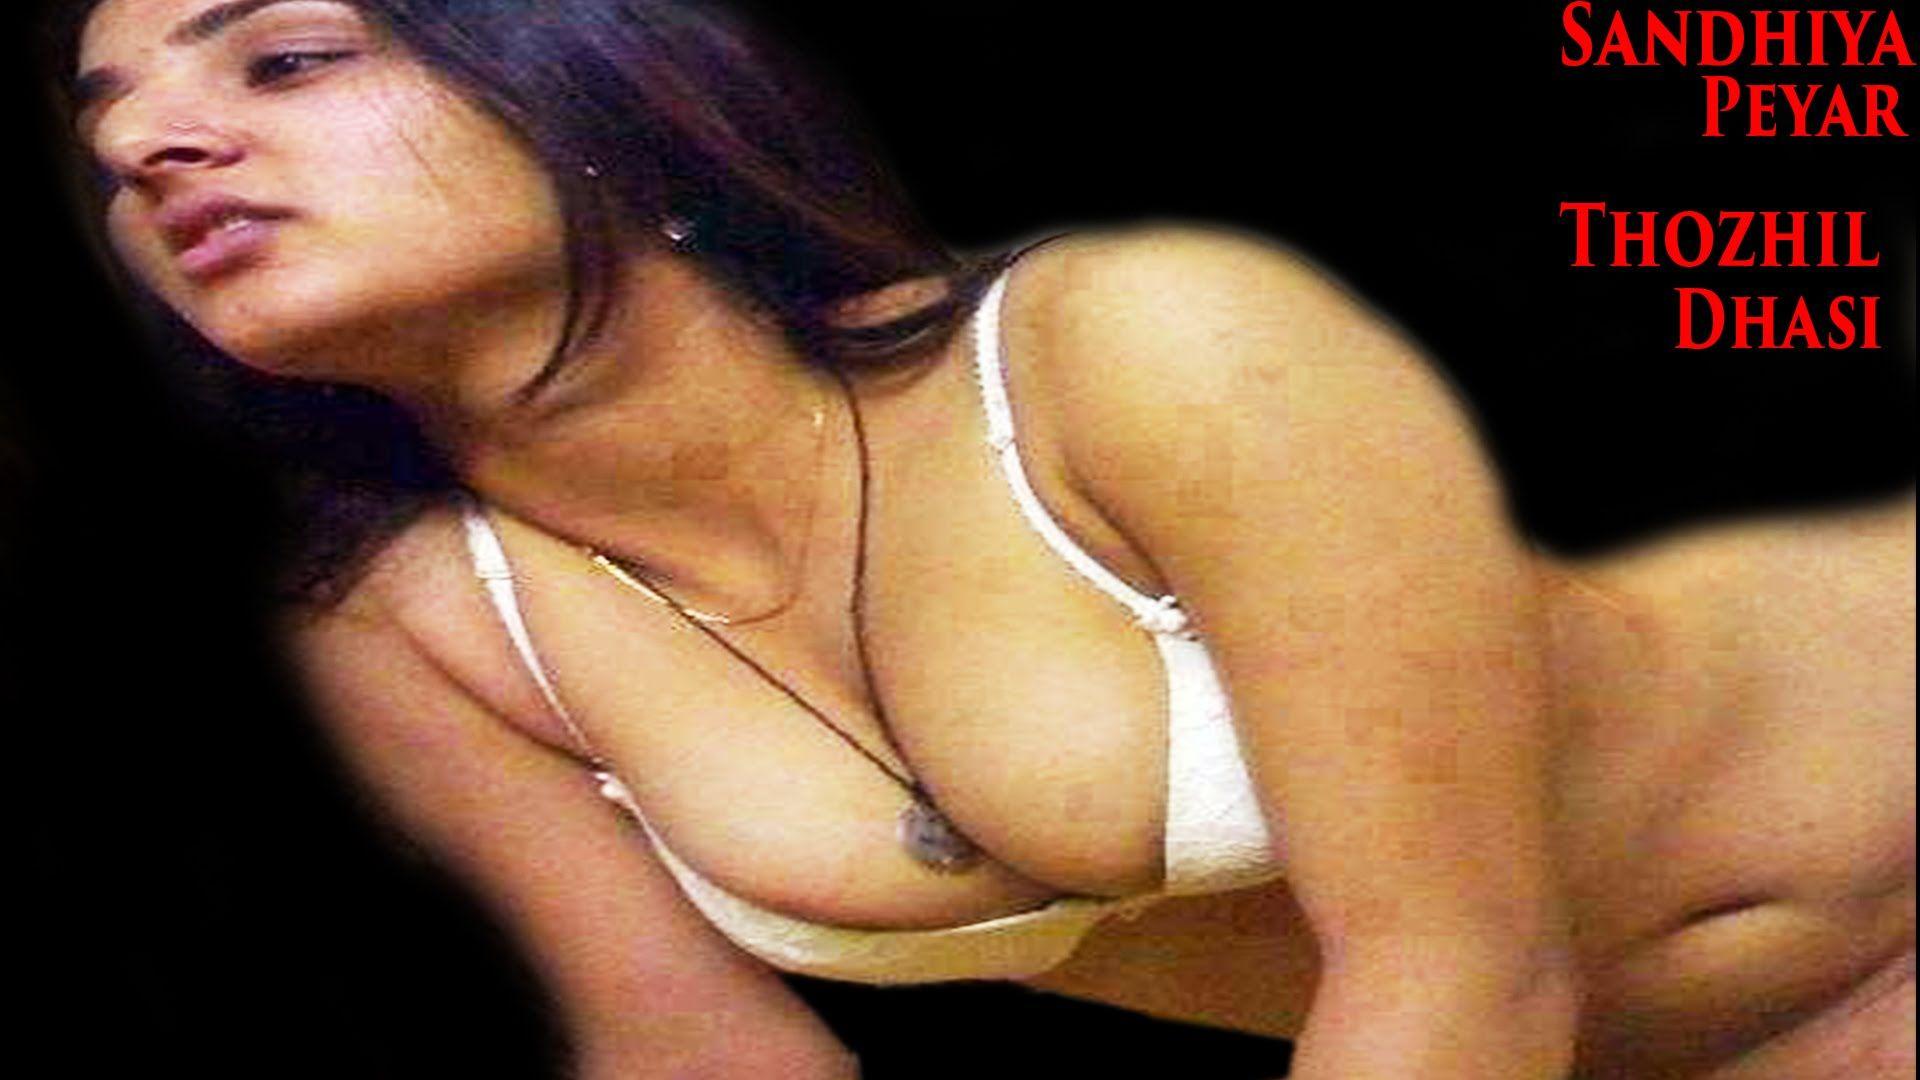 Mallu lesbian movies, kama sutra sex guide